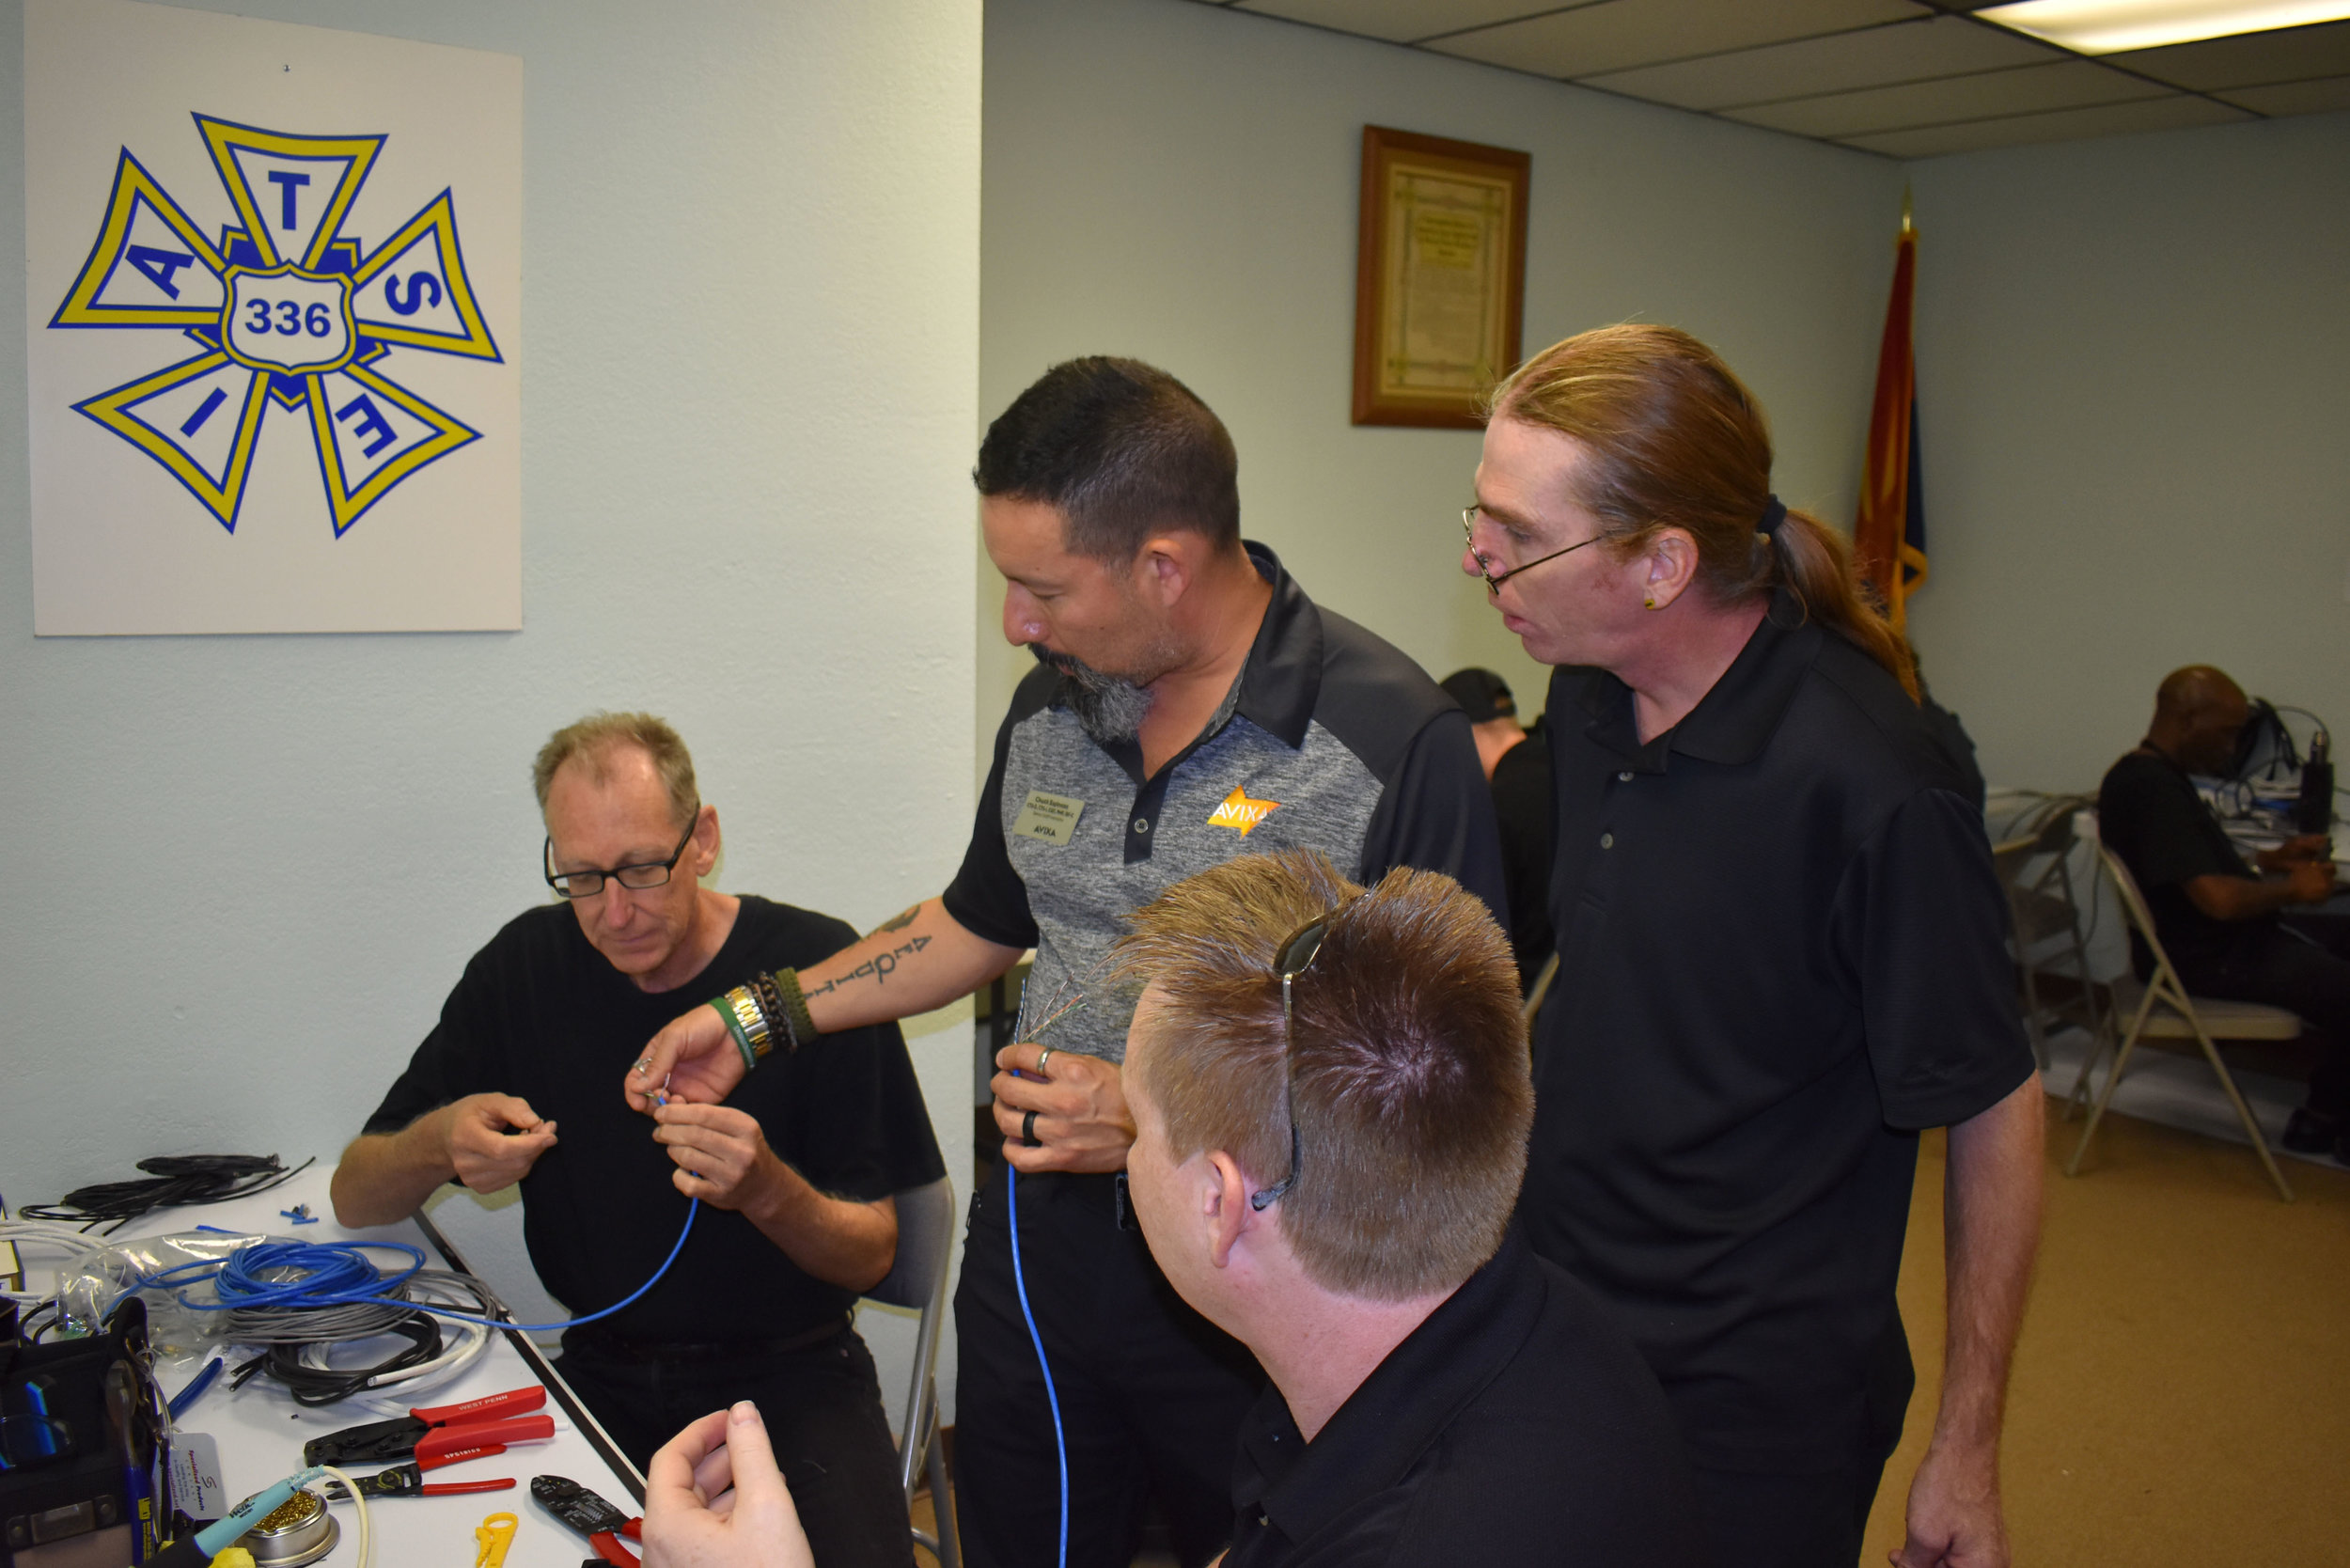 IATSE TTF Presents AVIXA Installation 1: Systems Fabrication in Phoenix, AZ | August 27-29, 2019